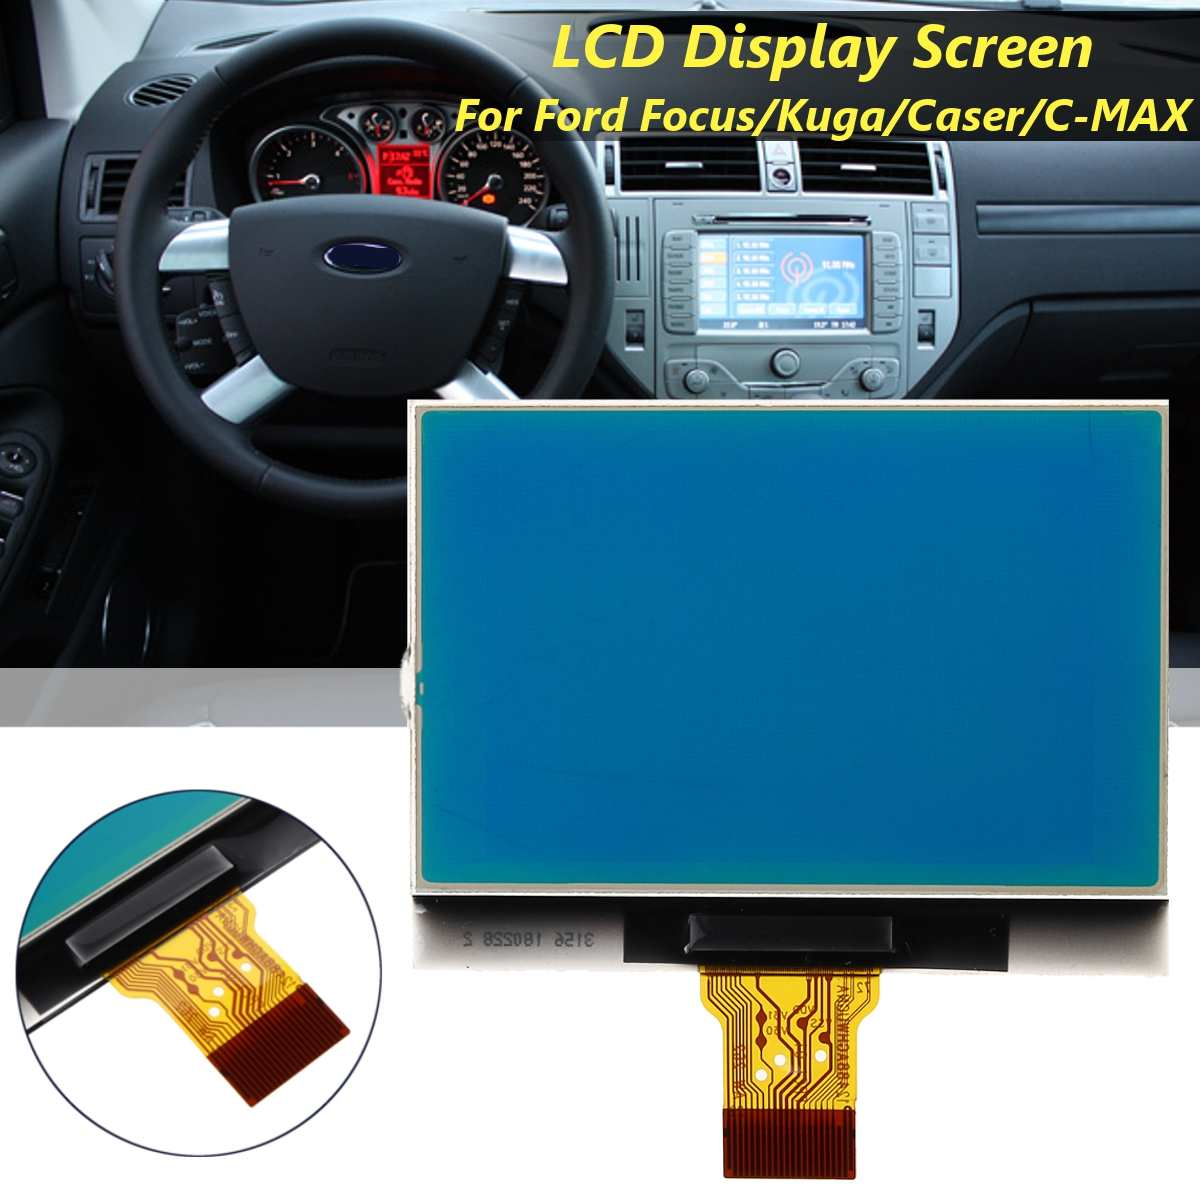 Tablero pantalla LCD pantalla píxel reparación manómetro Cluster para Ford Focus Kuga Caser para C-MAX 2008 2009 2010 2011